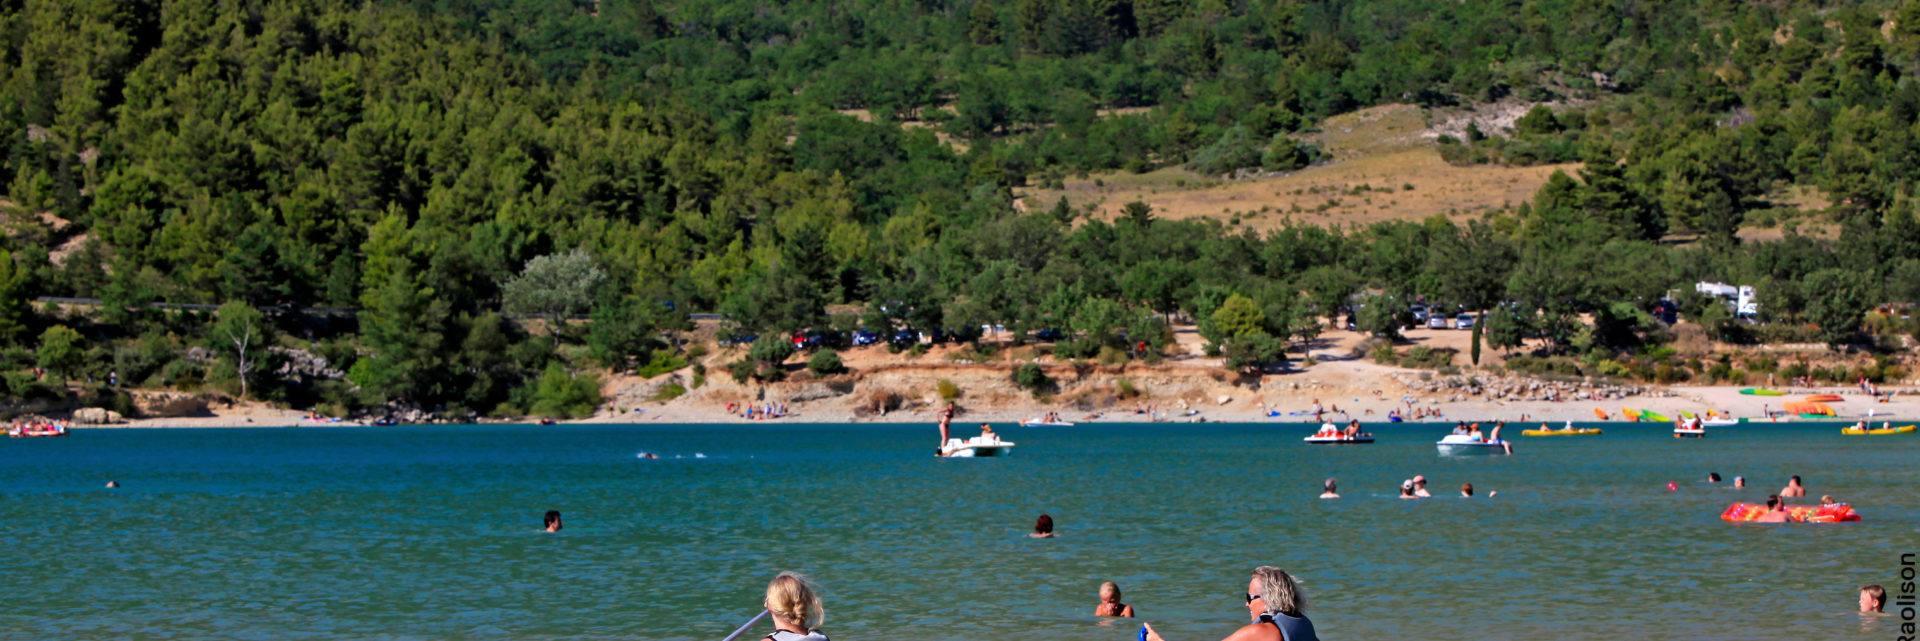 Aiguines canoe lac vegetation plage baignade var